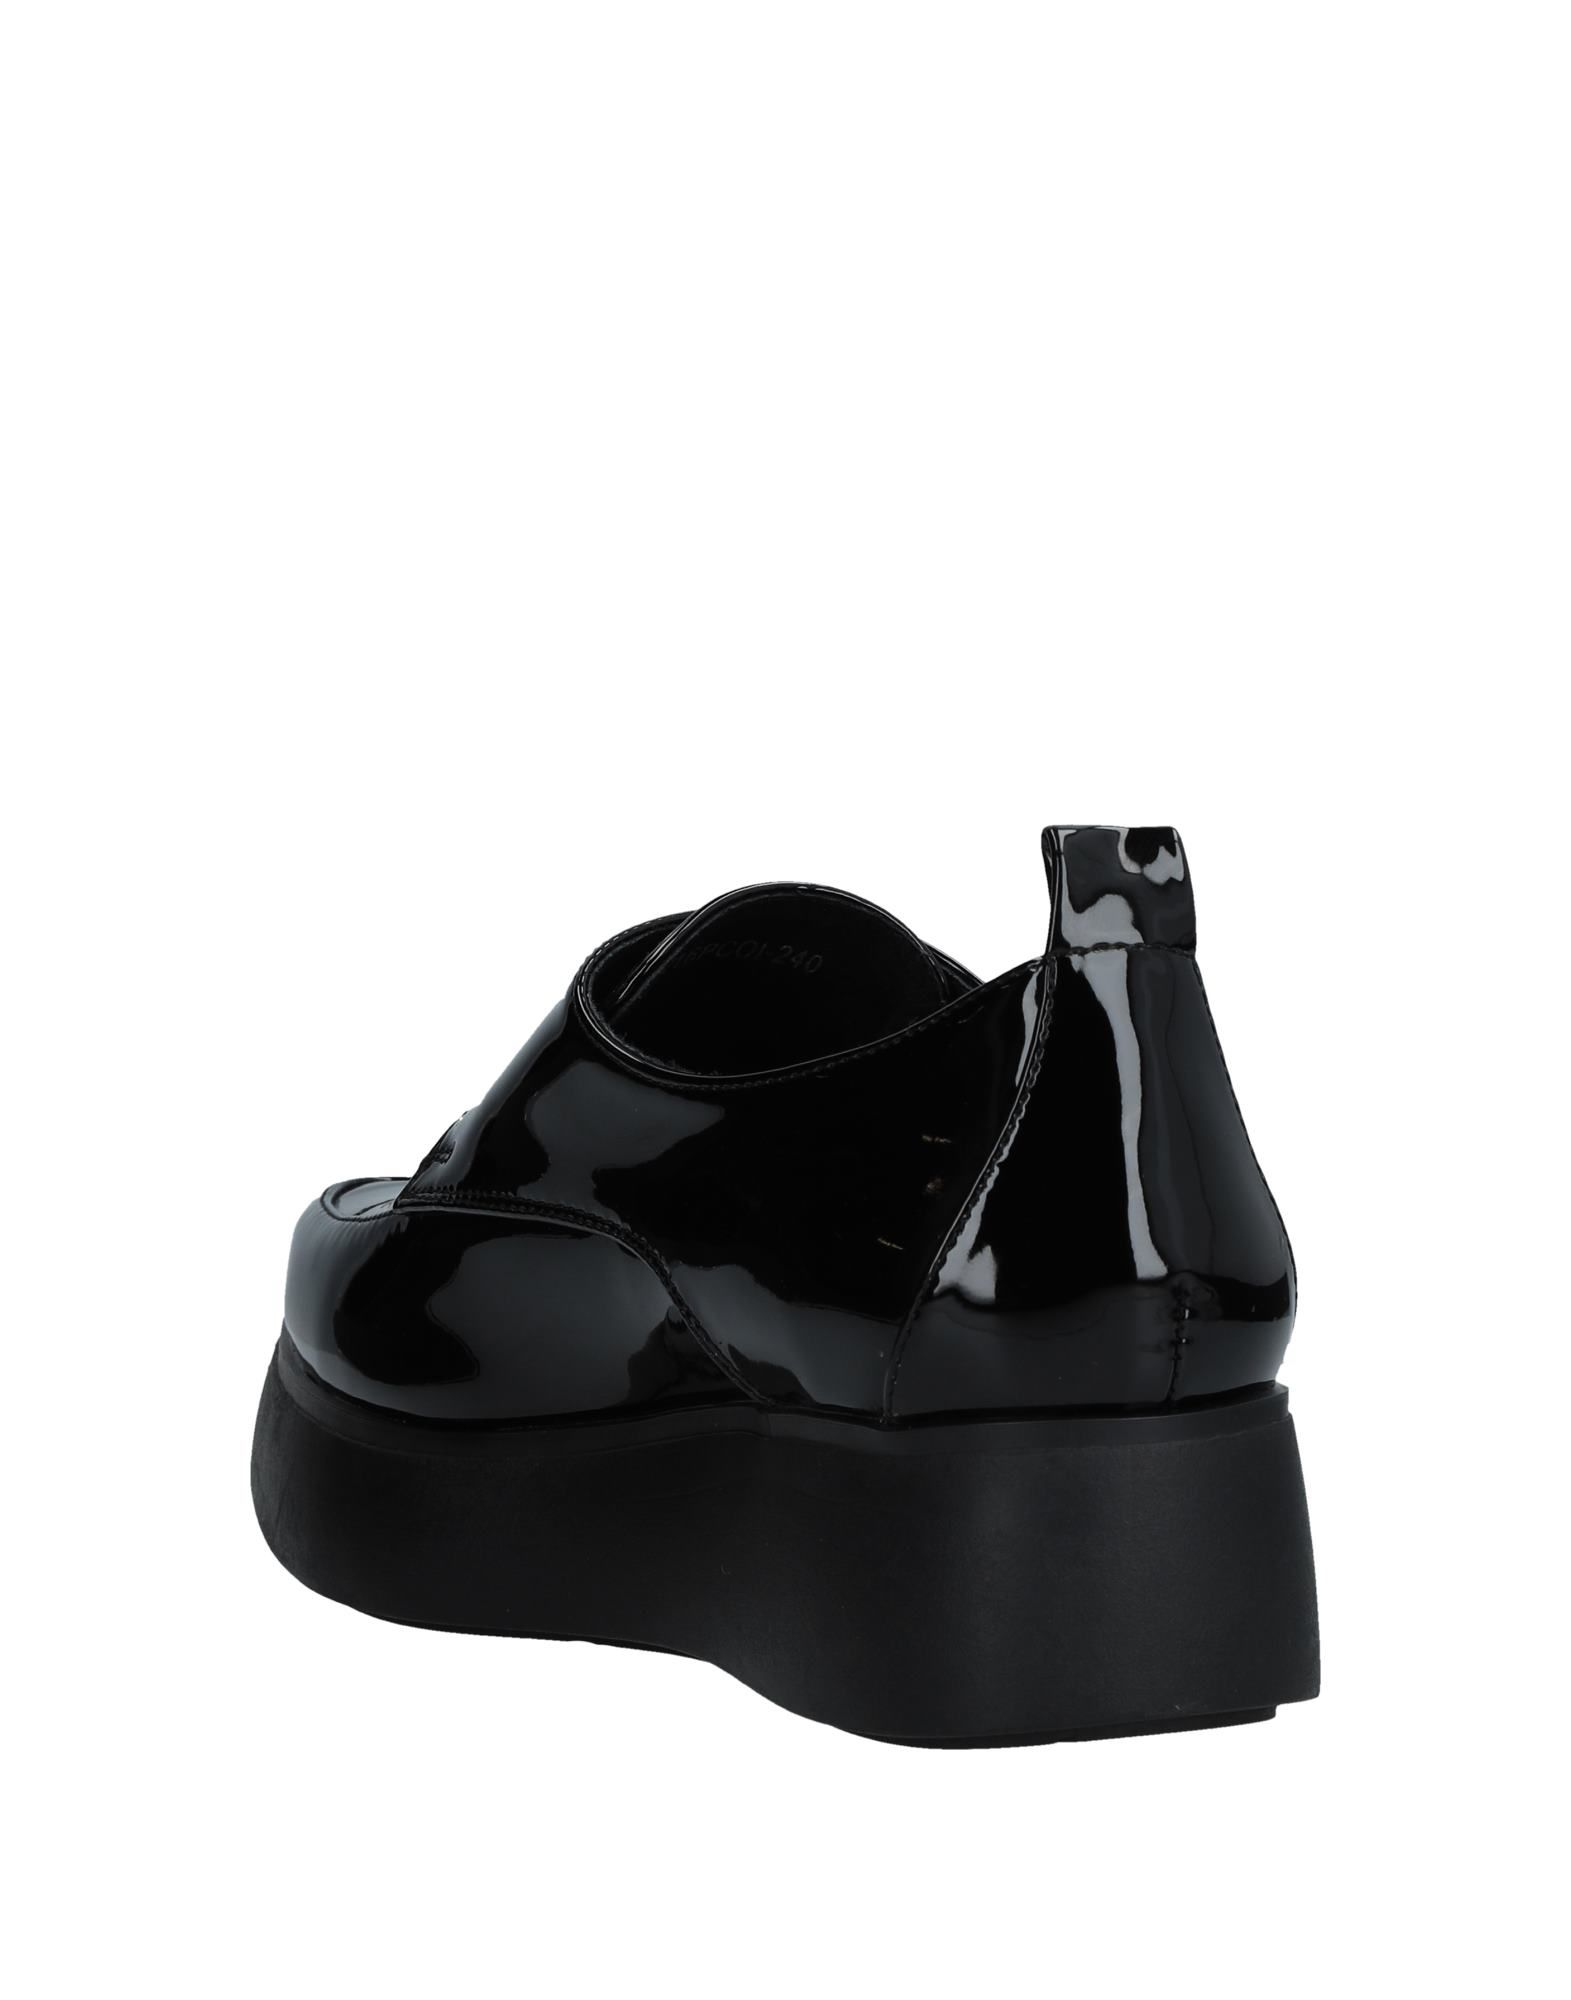 67 Sixtyseven 11543104AT Mokassins Damen  11543104AT Sixtyseven Gute Qualität beliebte Schuhe 9920f0